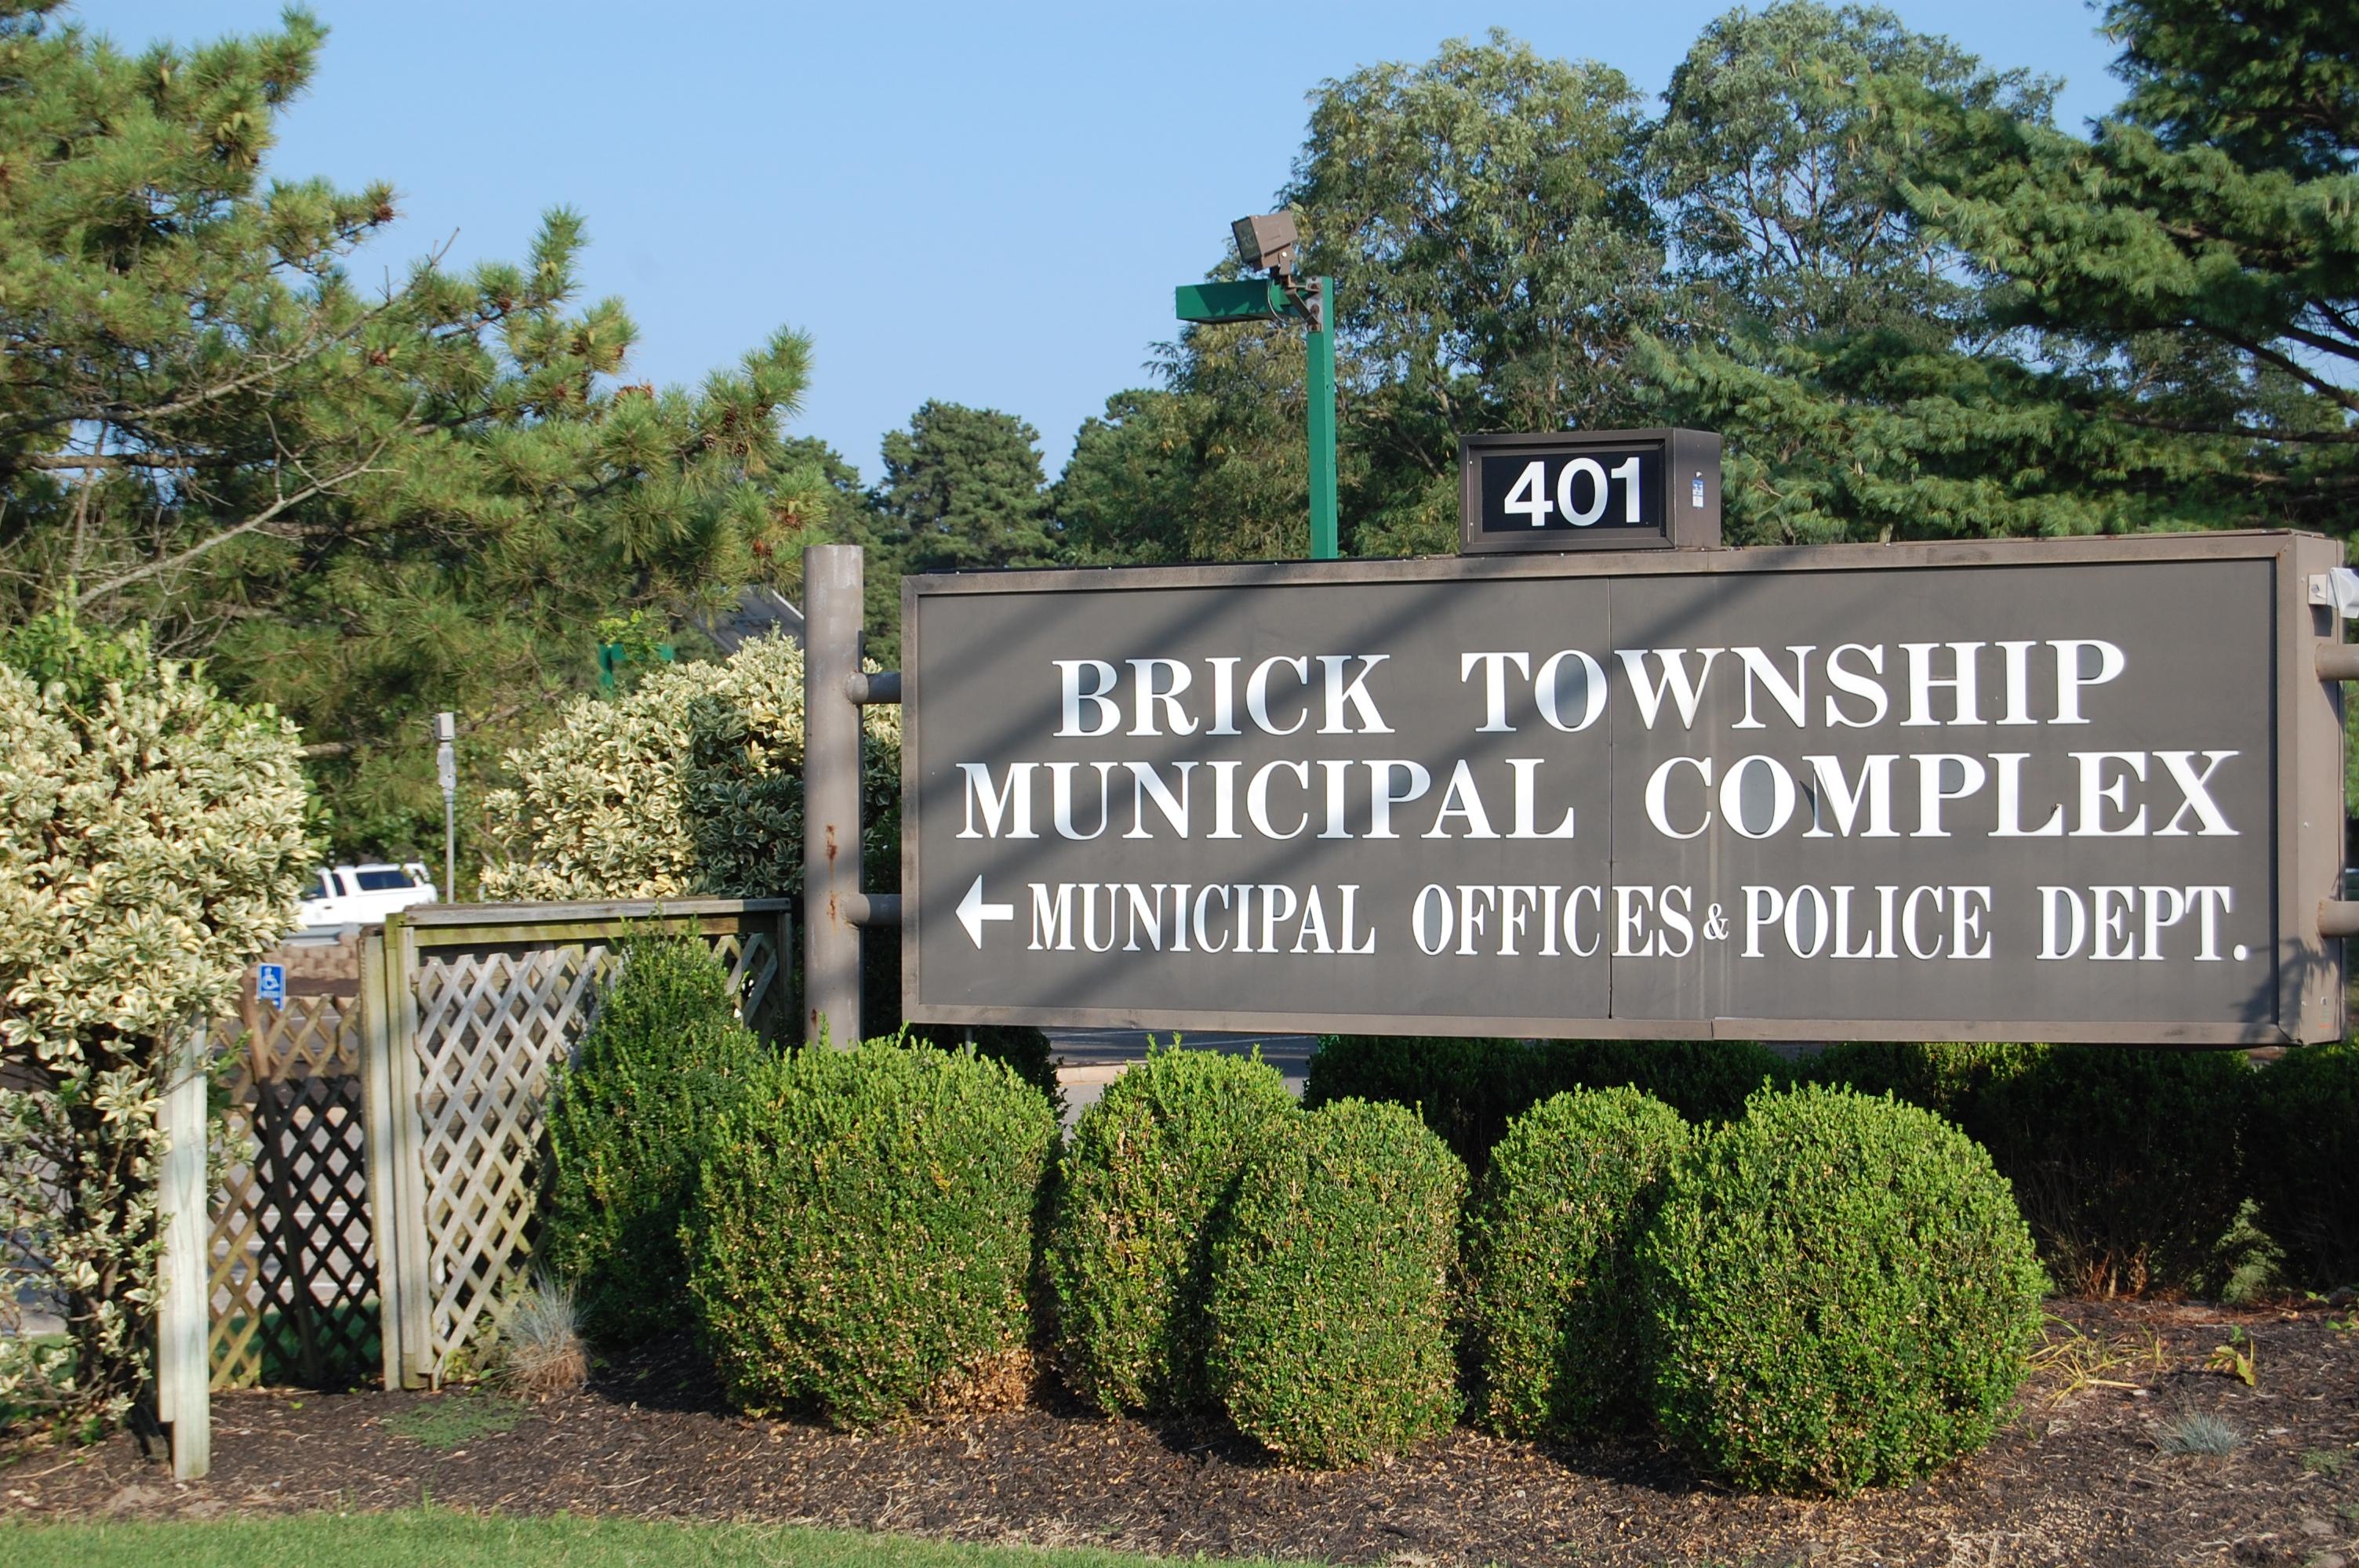 The Brick Township municipal complex. (Photo: Daniel Nee)